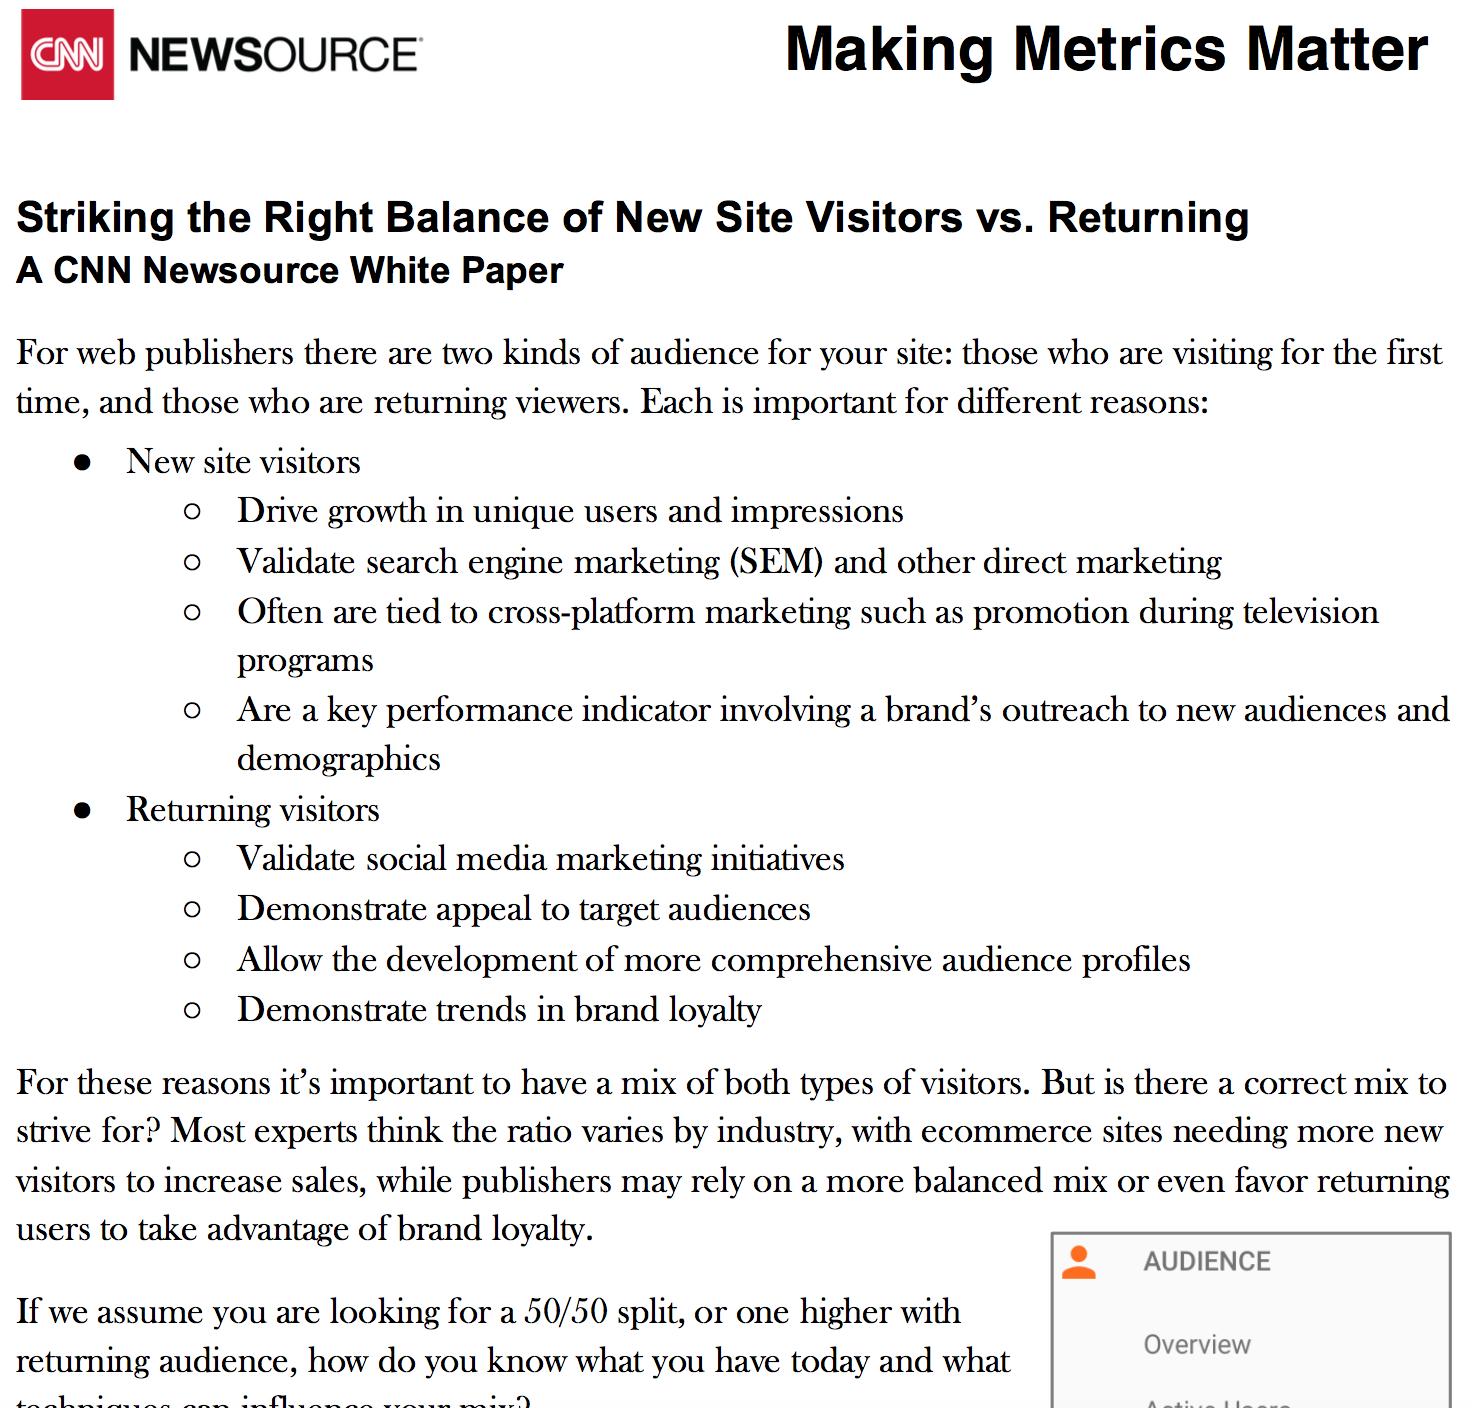 Making Digital Metrics Matter